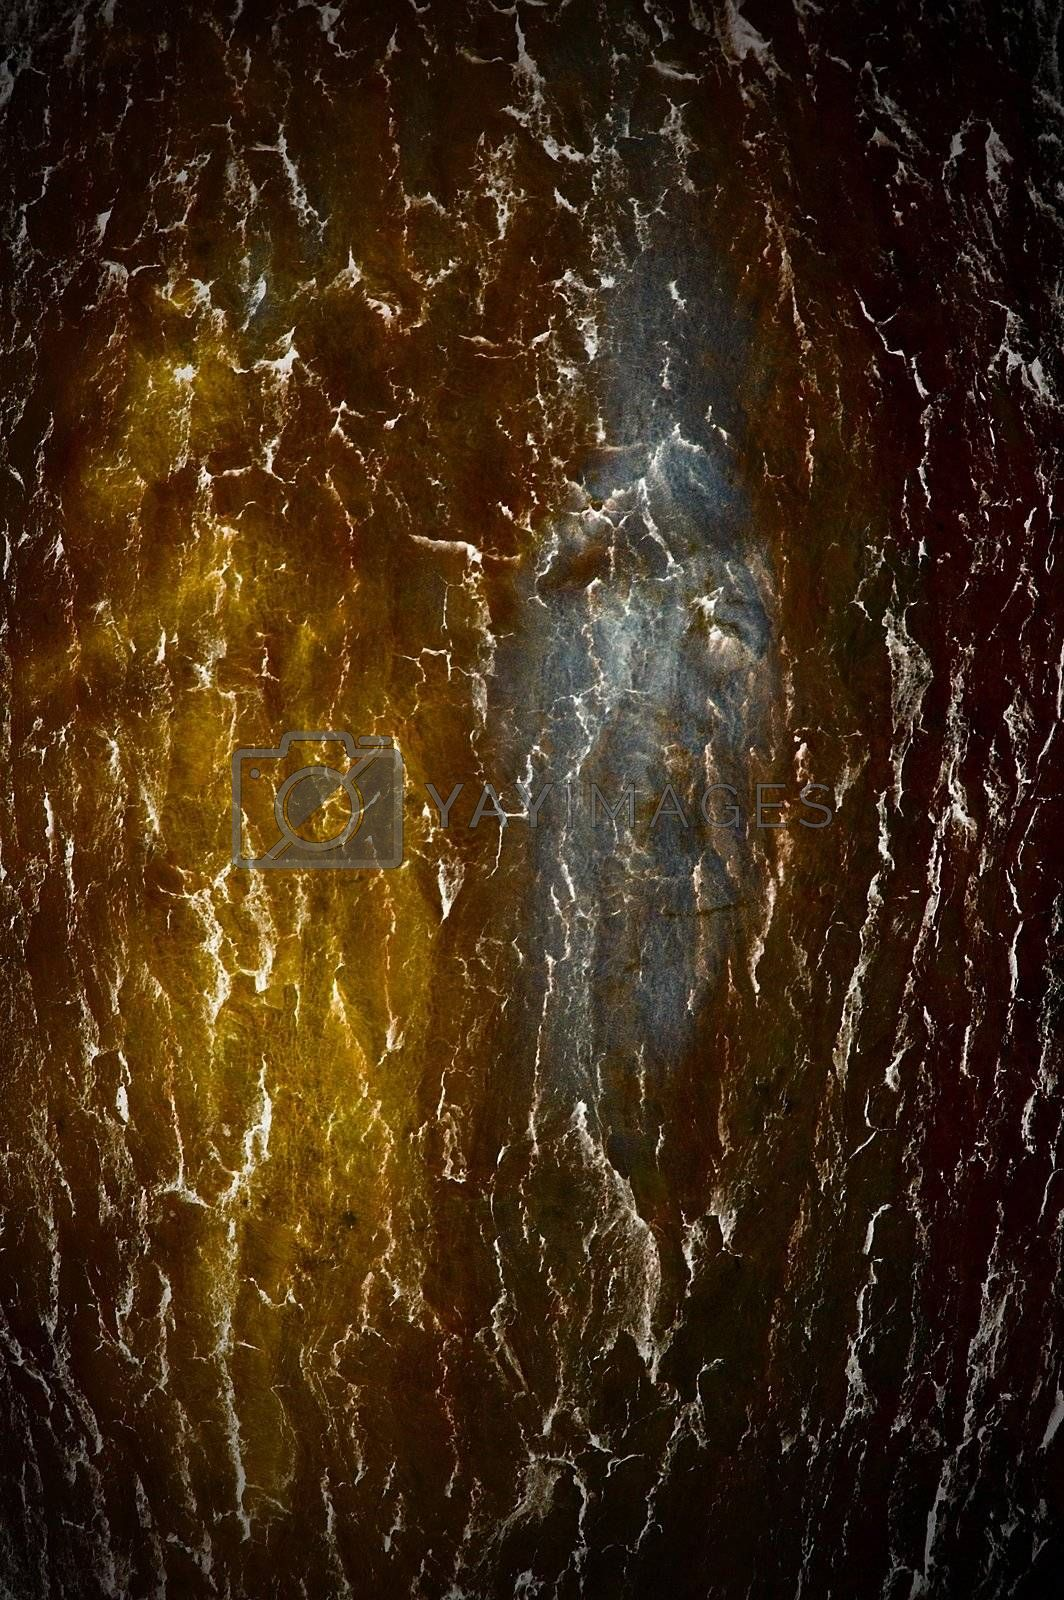 Rusty grunge iron surface